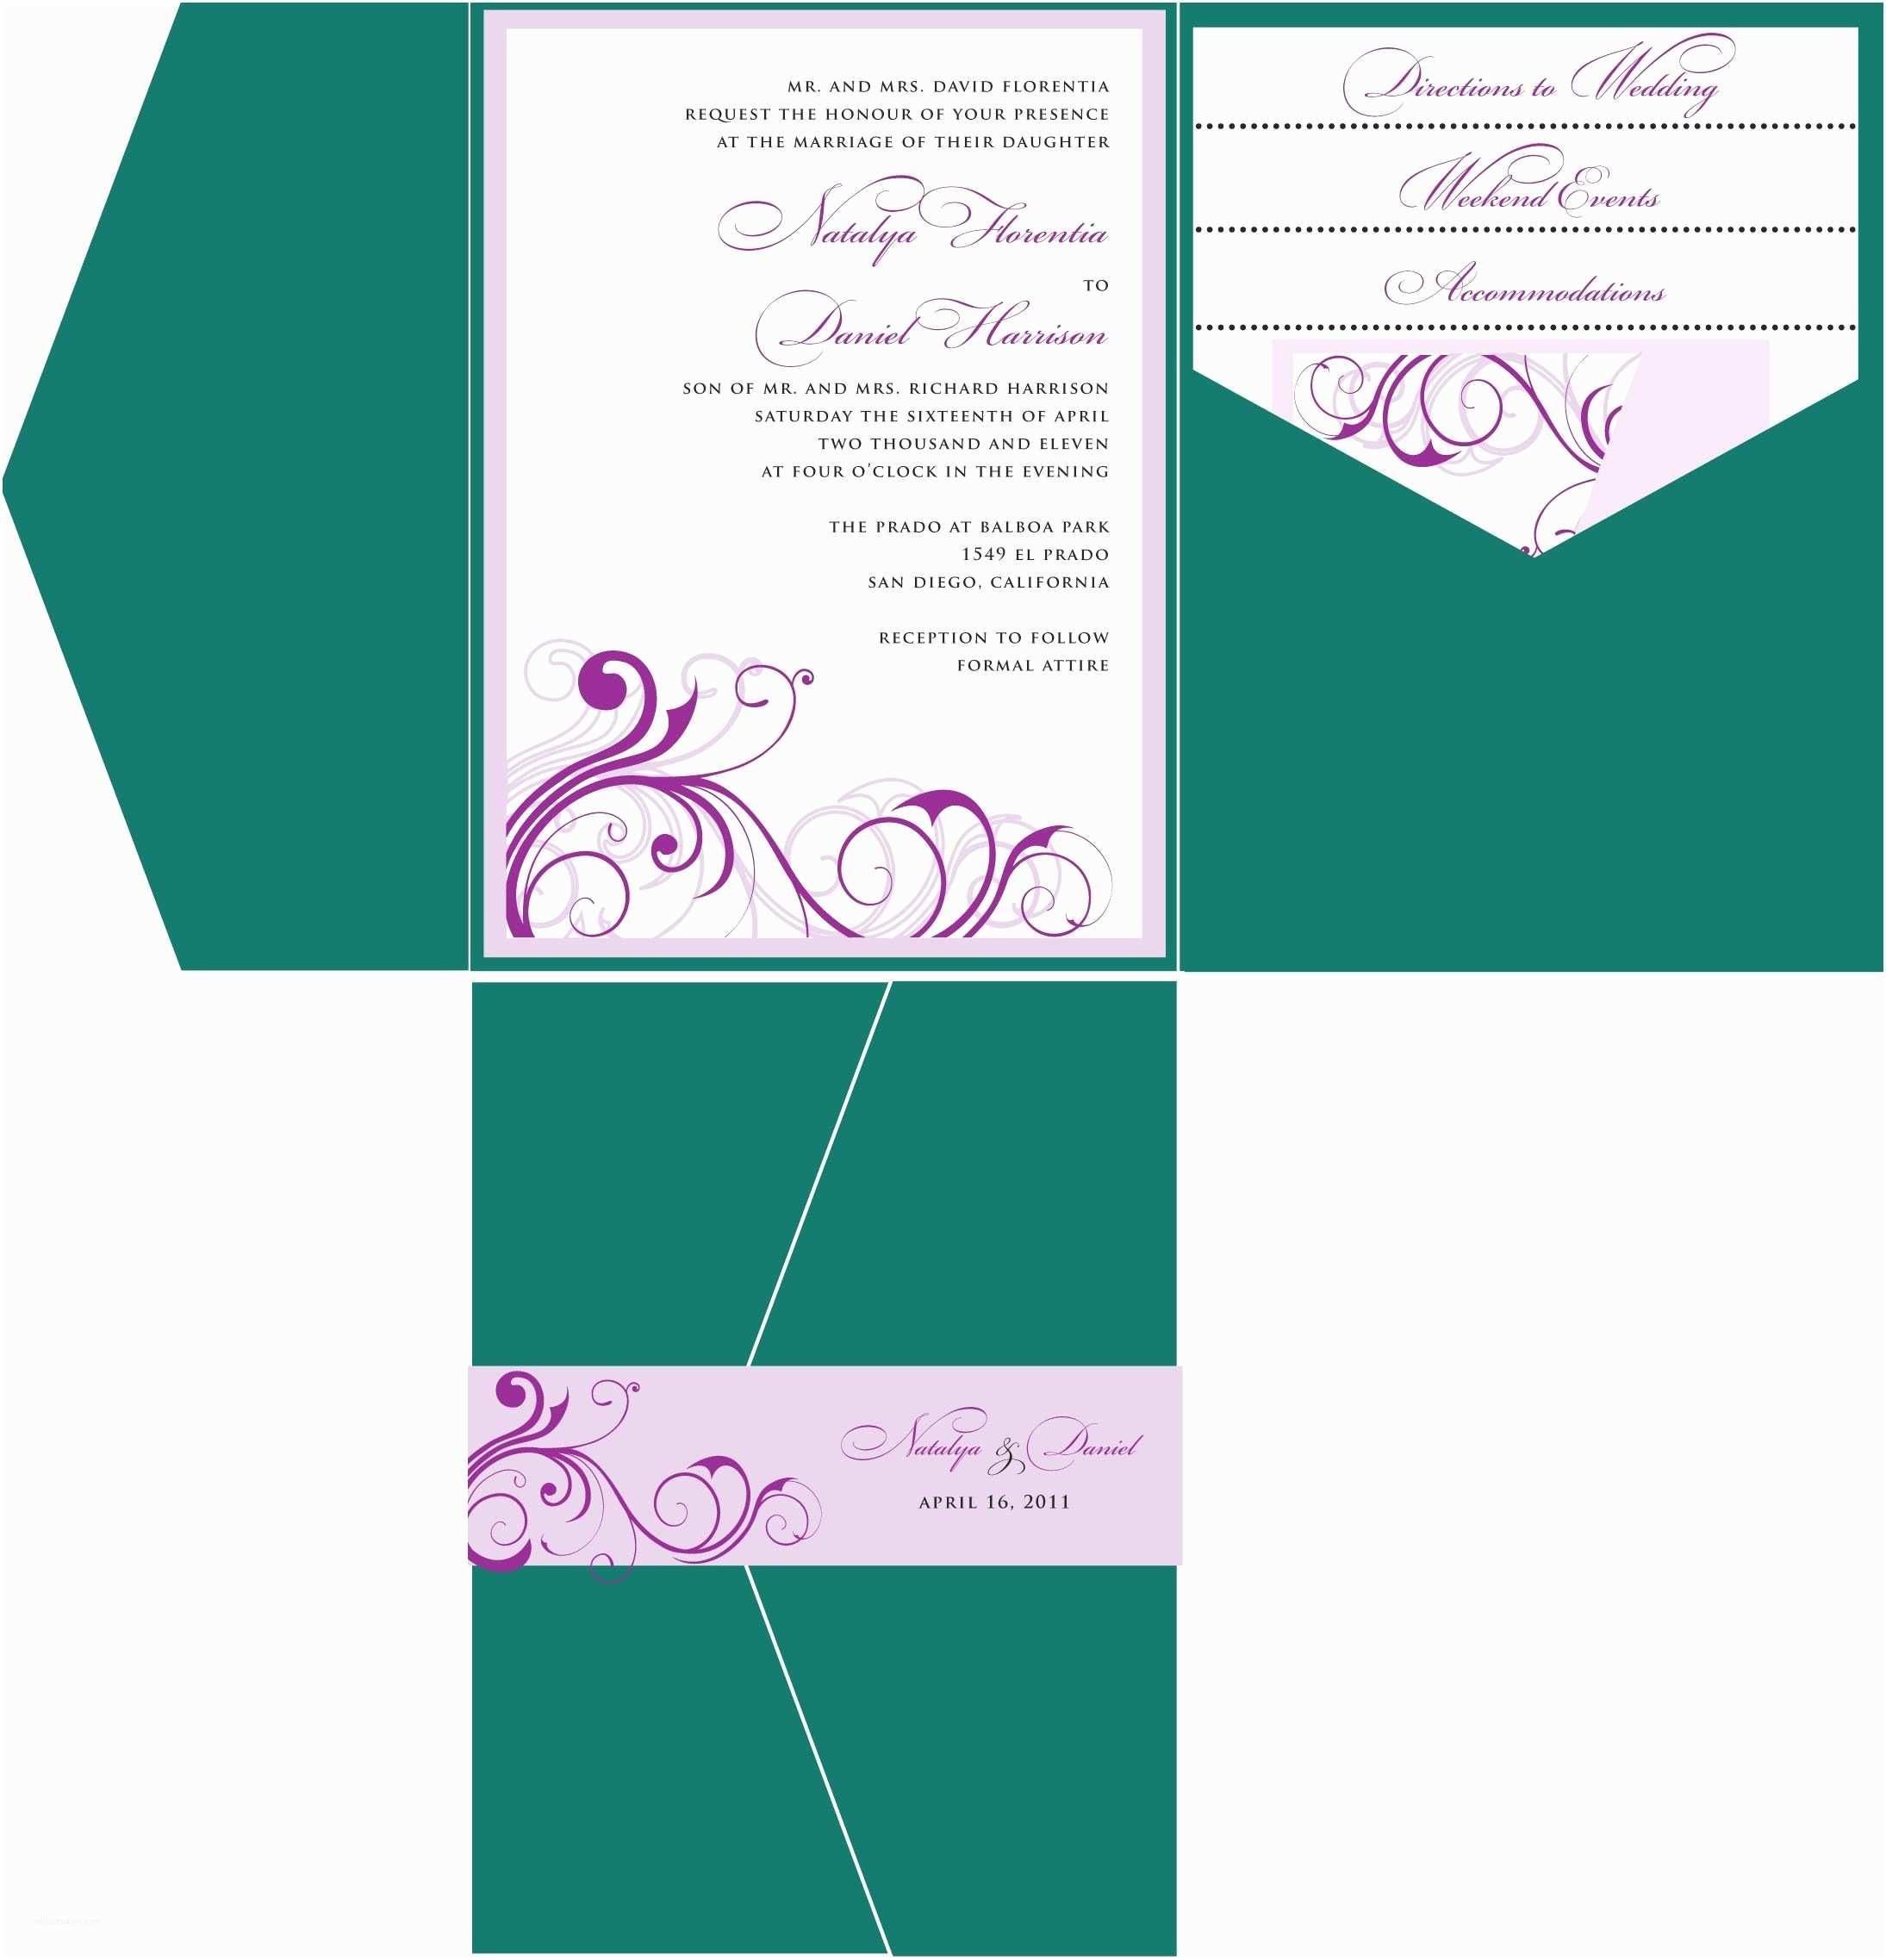 Free Wedding Invitation Templates for Word Wedding Invitations Template Wedding Invitations